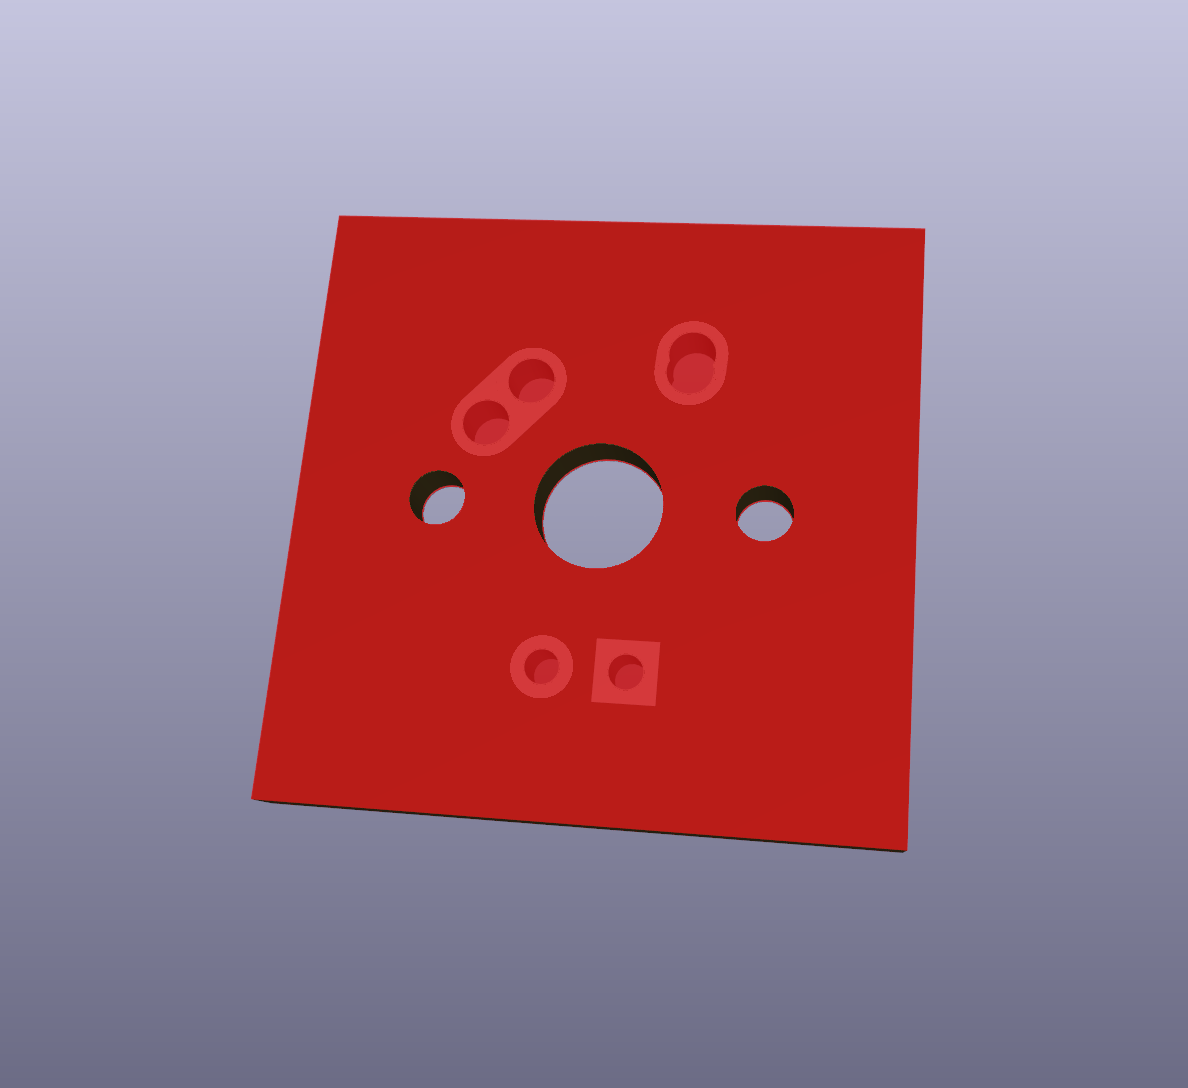 Top render Image